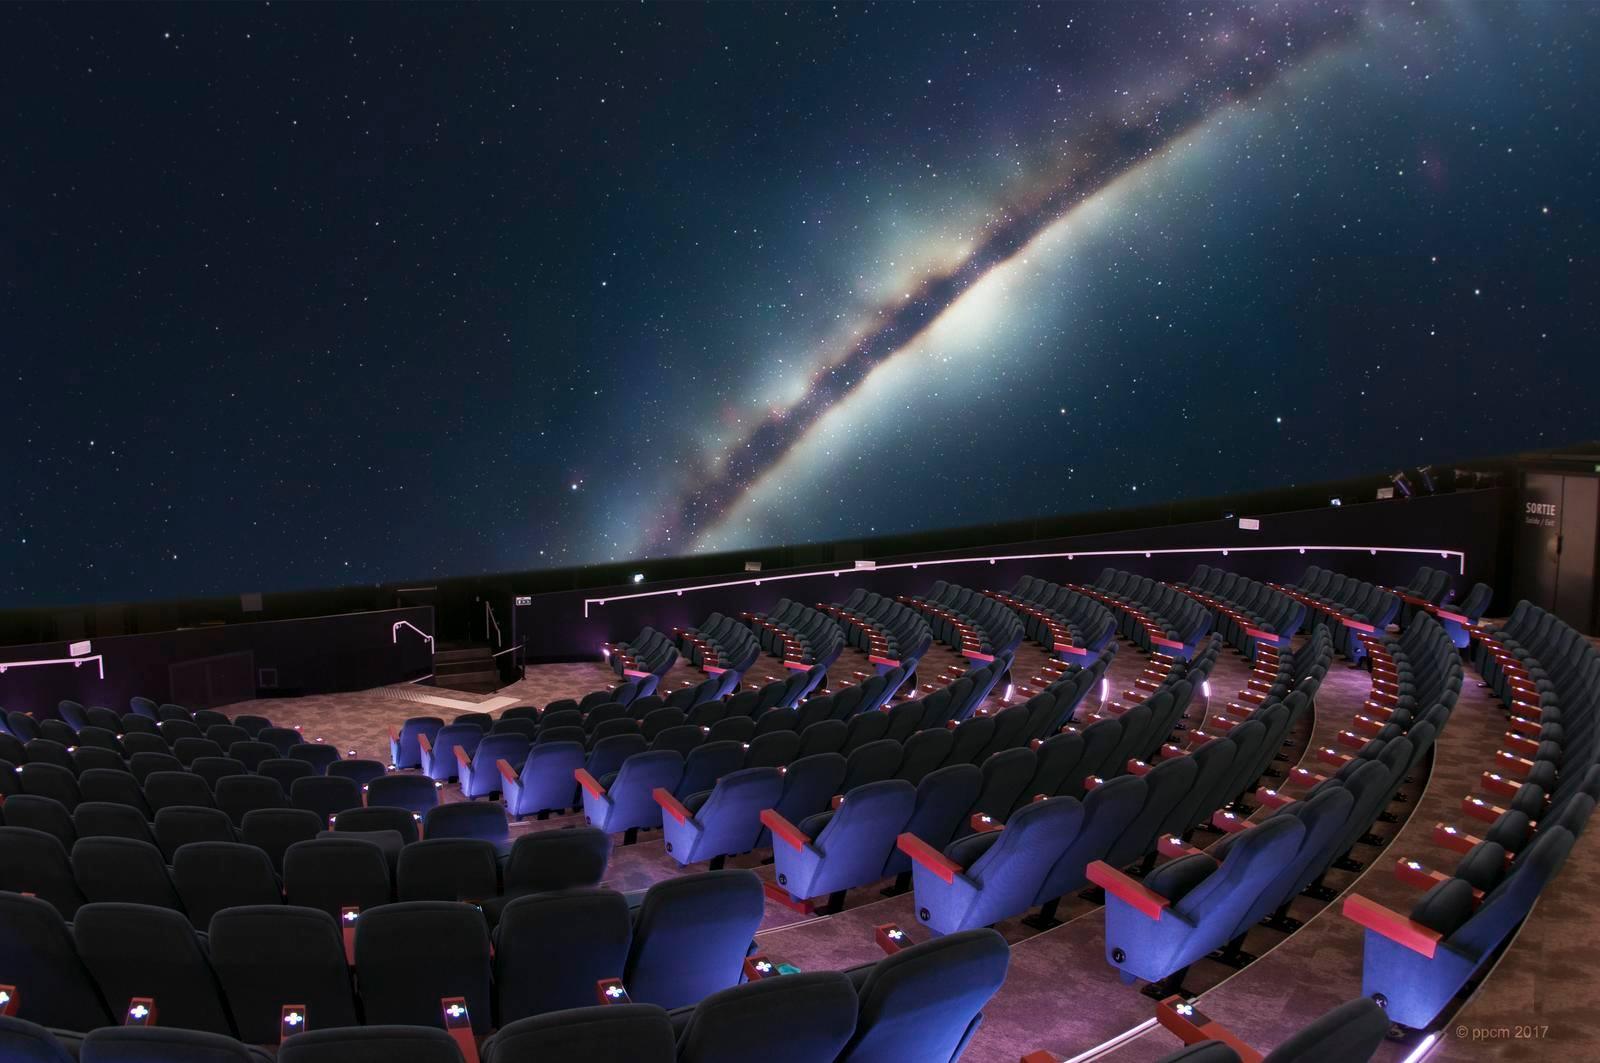 planetarium-rsa cosmos